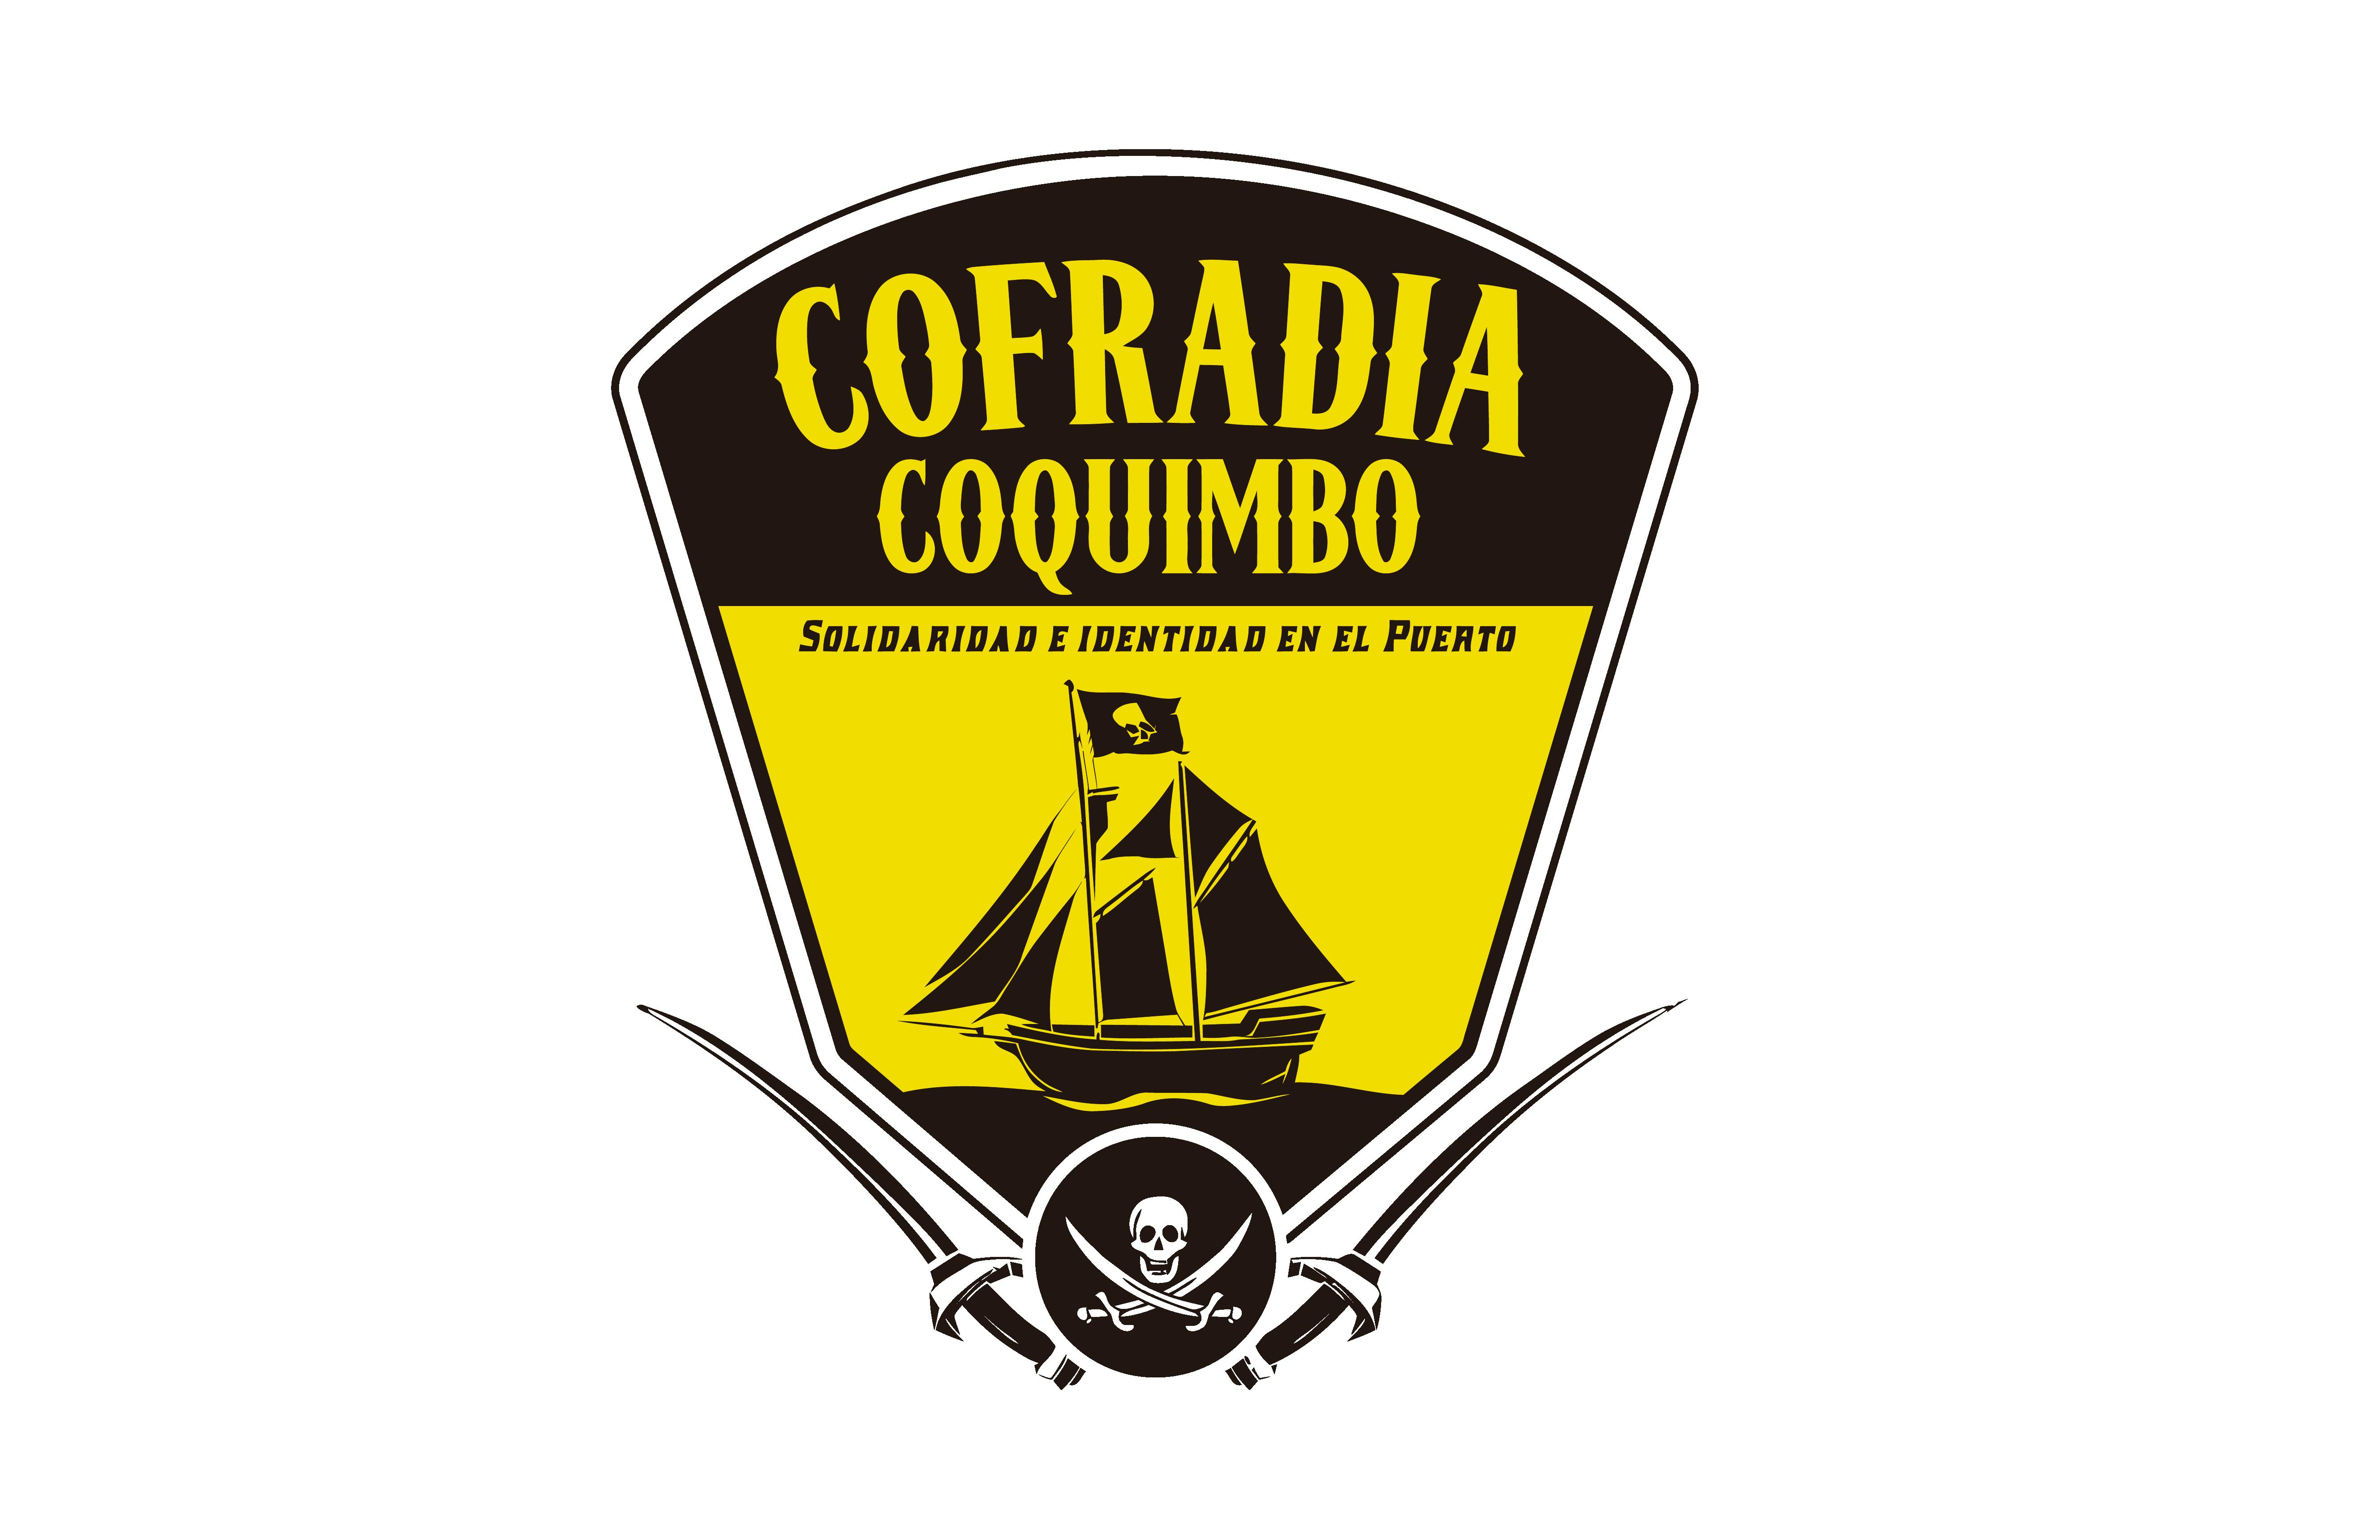 Cofradía Coquimbo